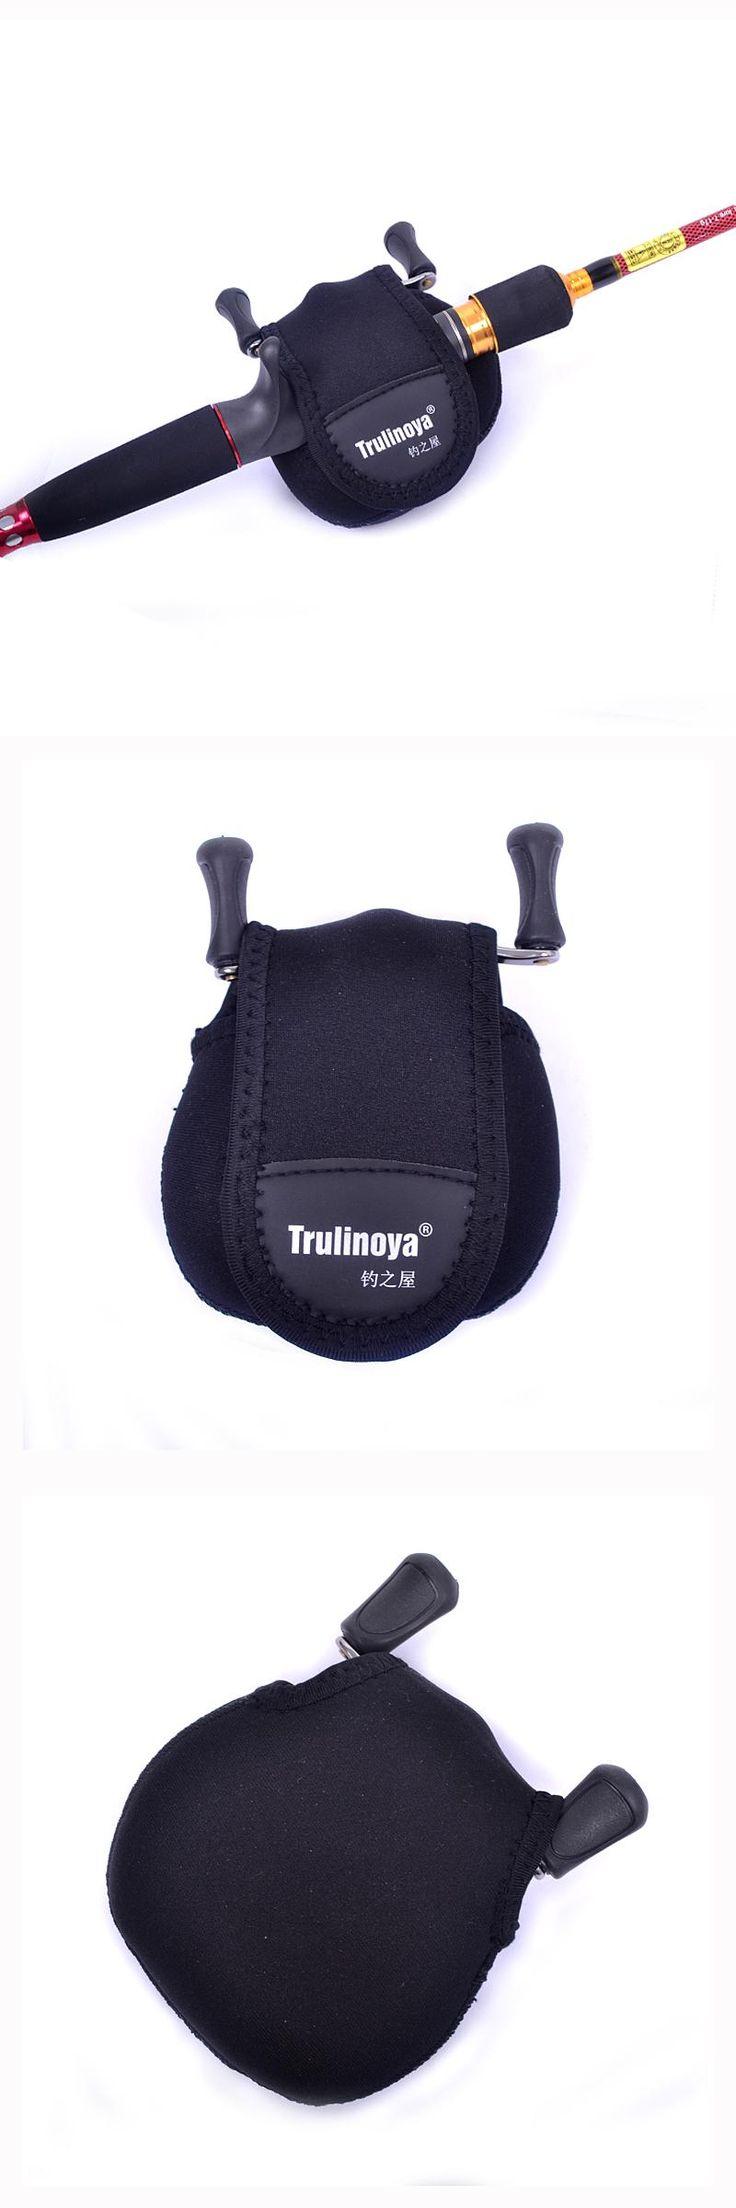 Fishing tackle craft supplies -  Visit To Buy Trulinoya Brand Fishing Bag Baitcasting Reel Bags Fishing Tackle Bags For